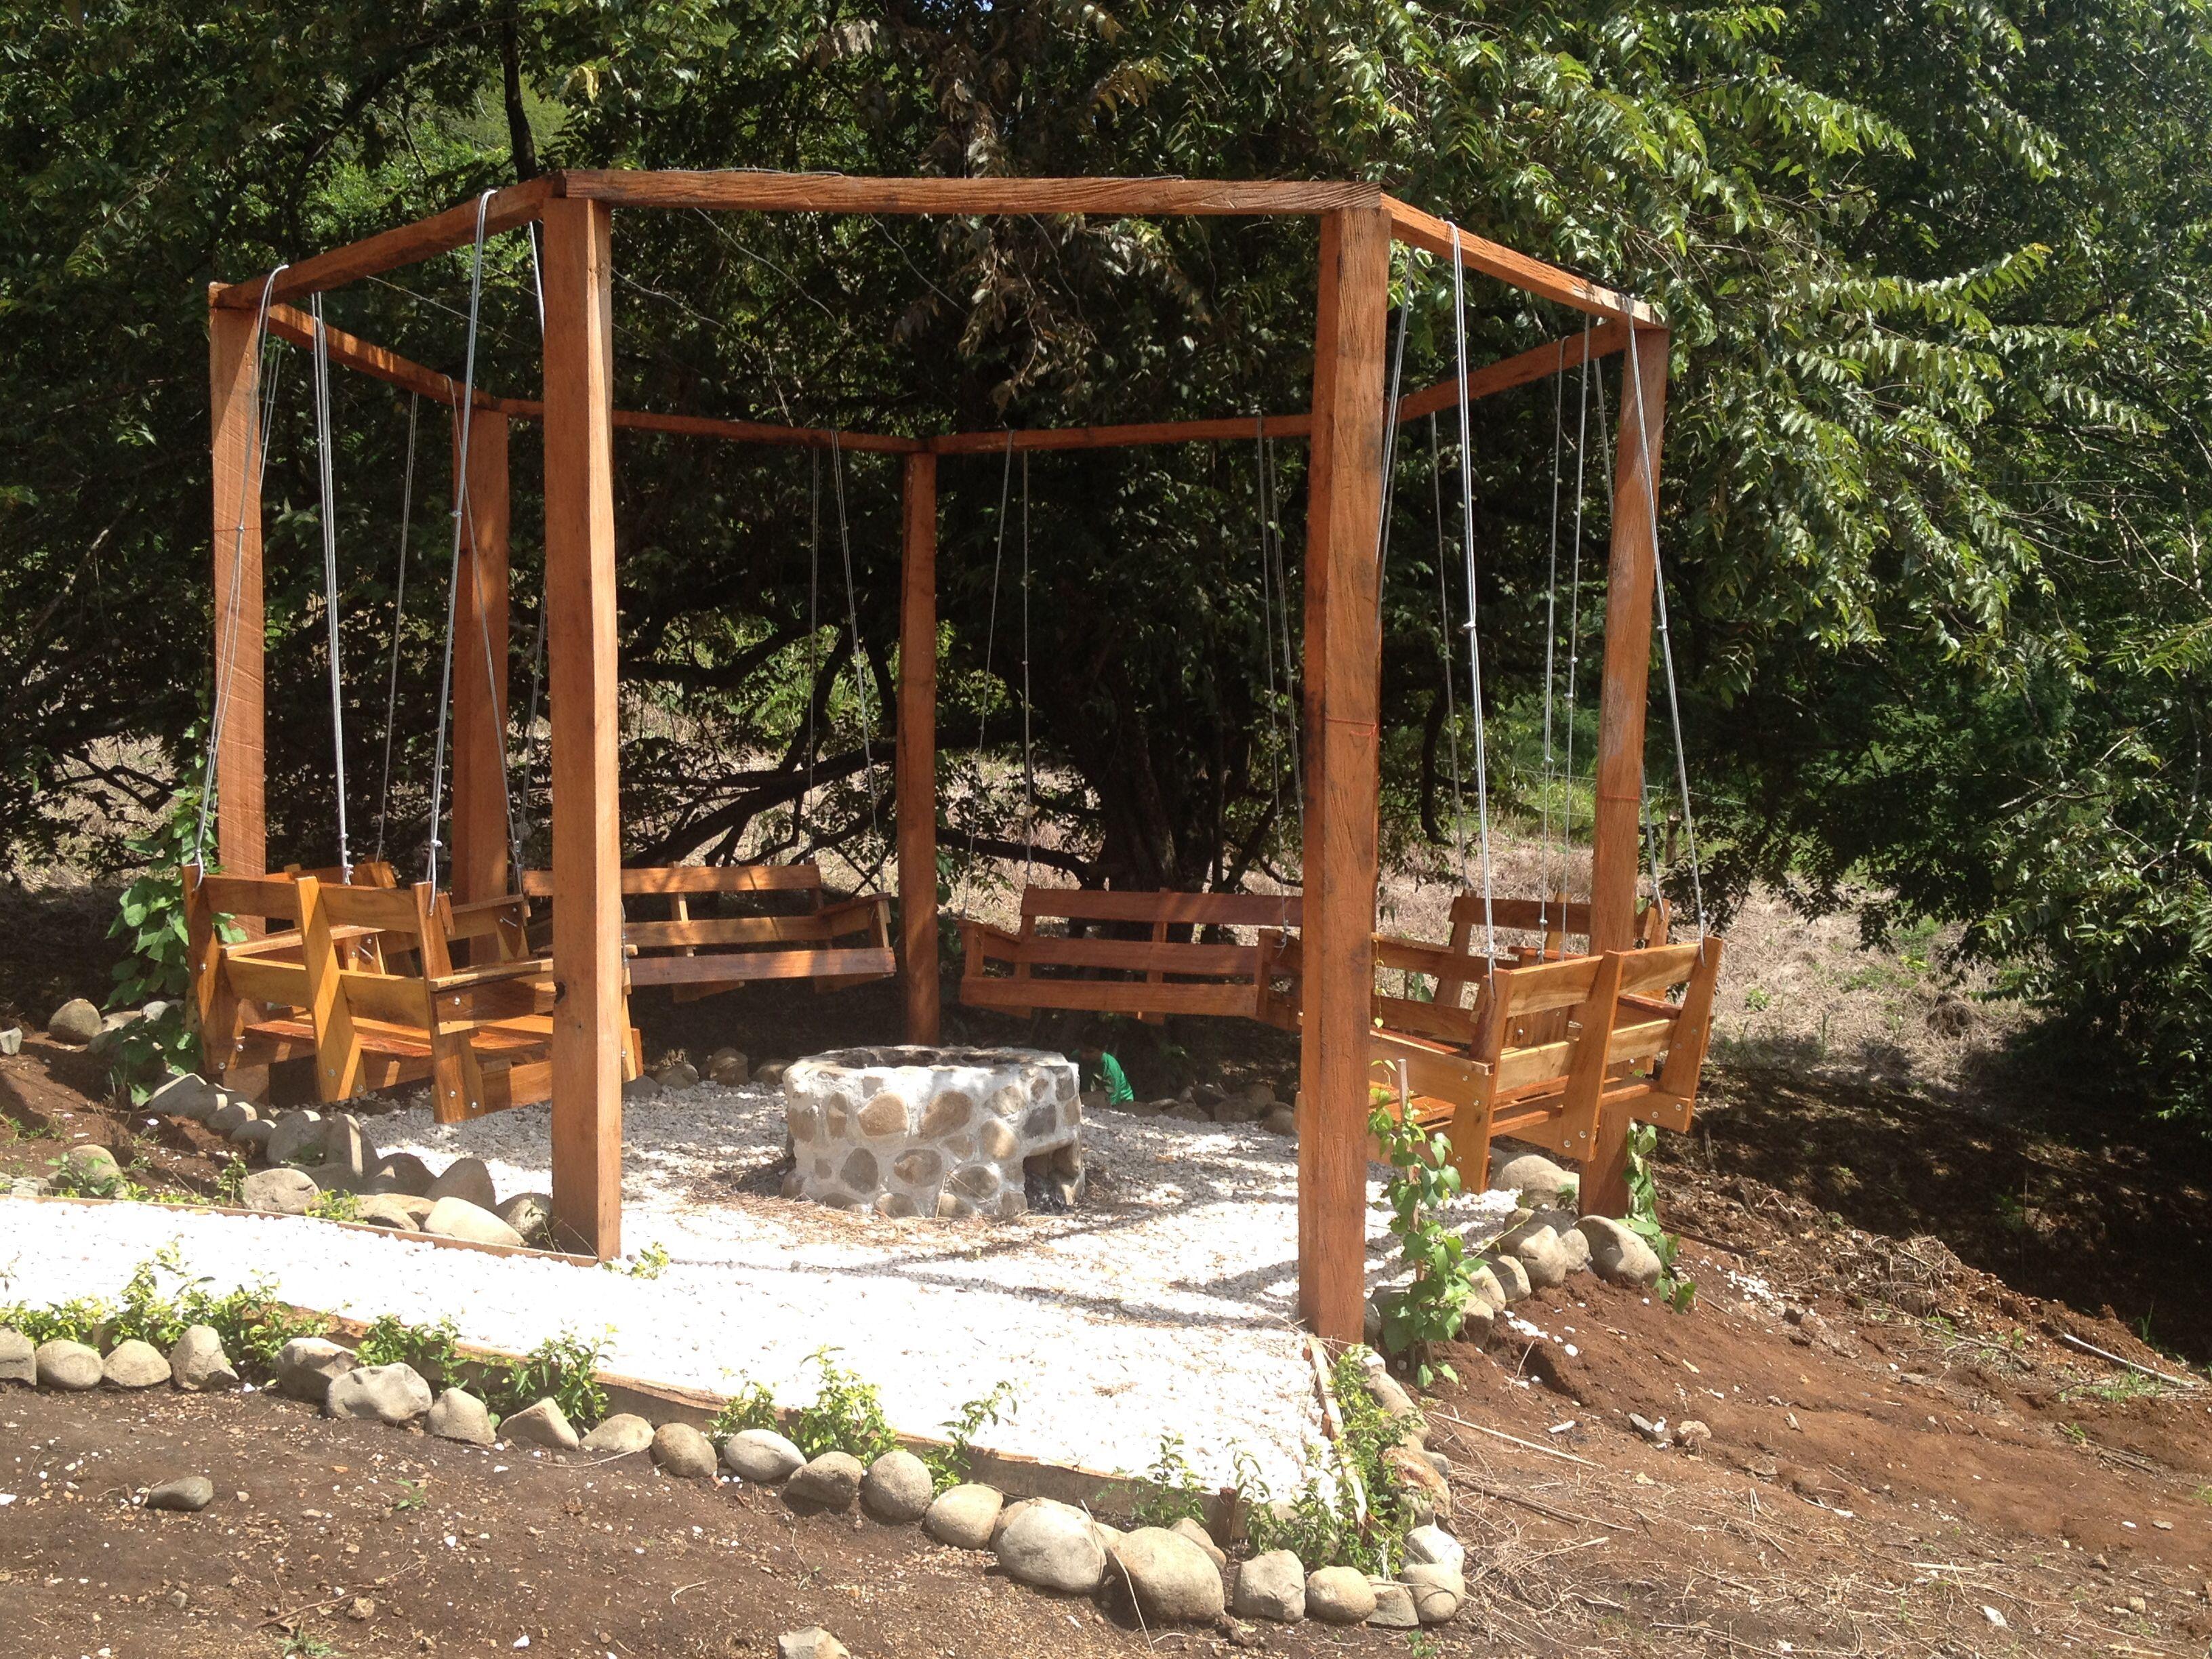 P rgola con hamacas y rea de fogata jardin pinterest - Hamacas para jardin ...